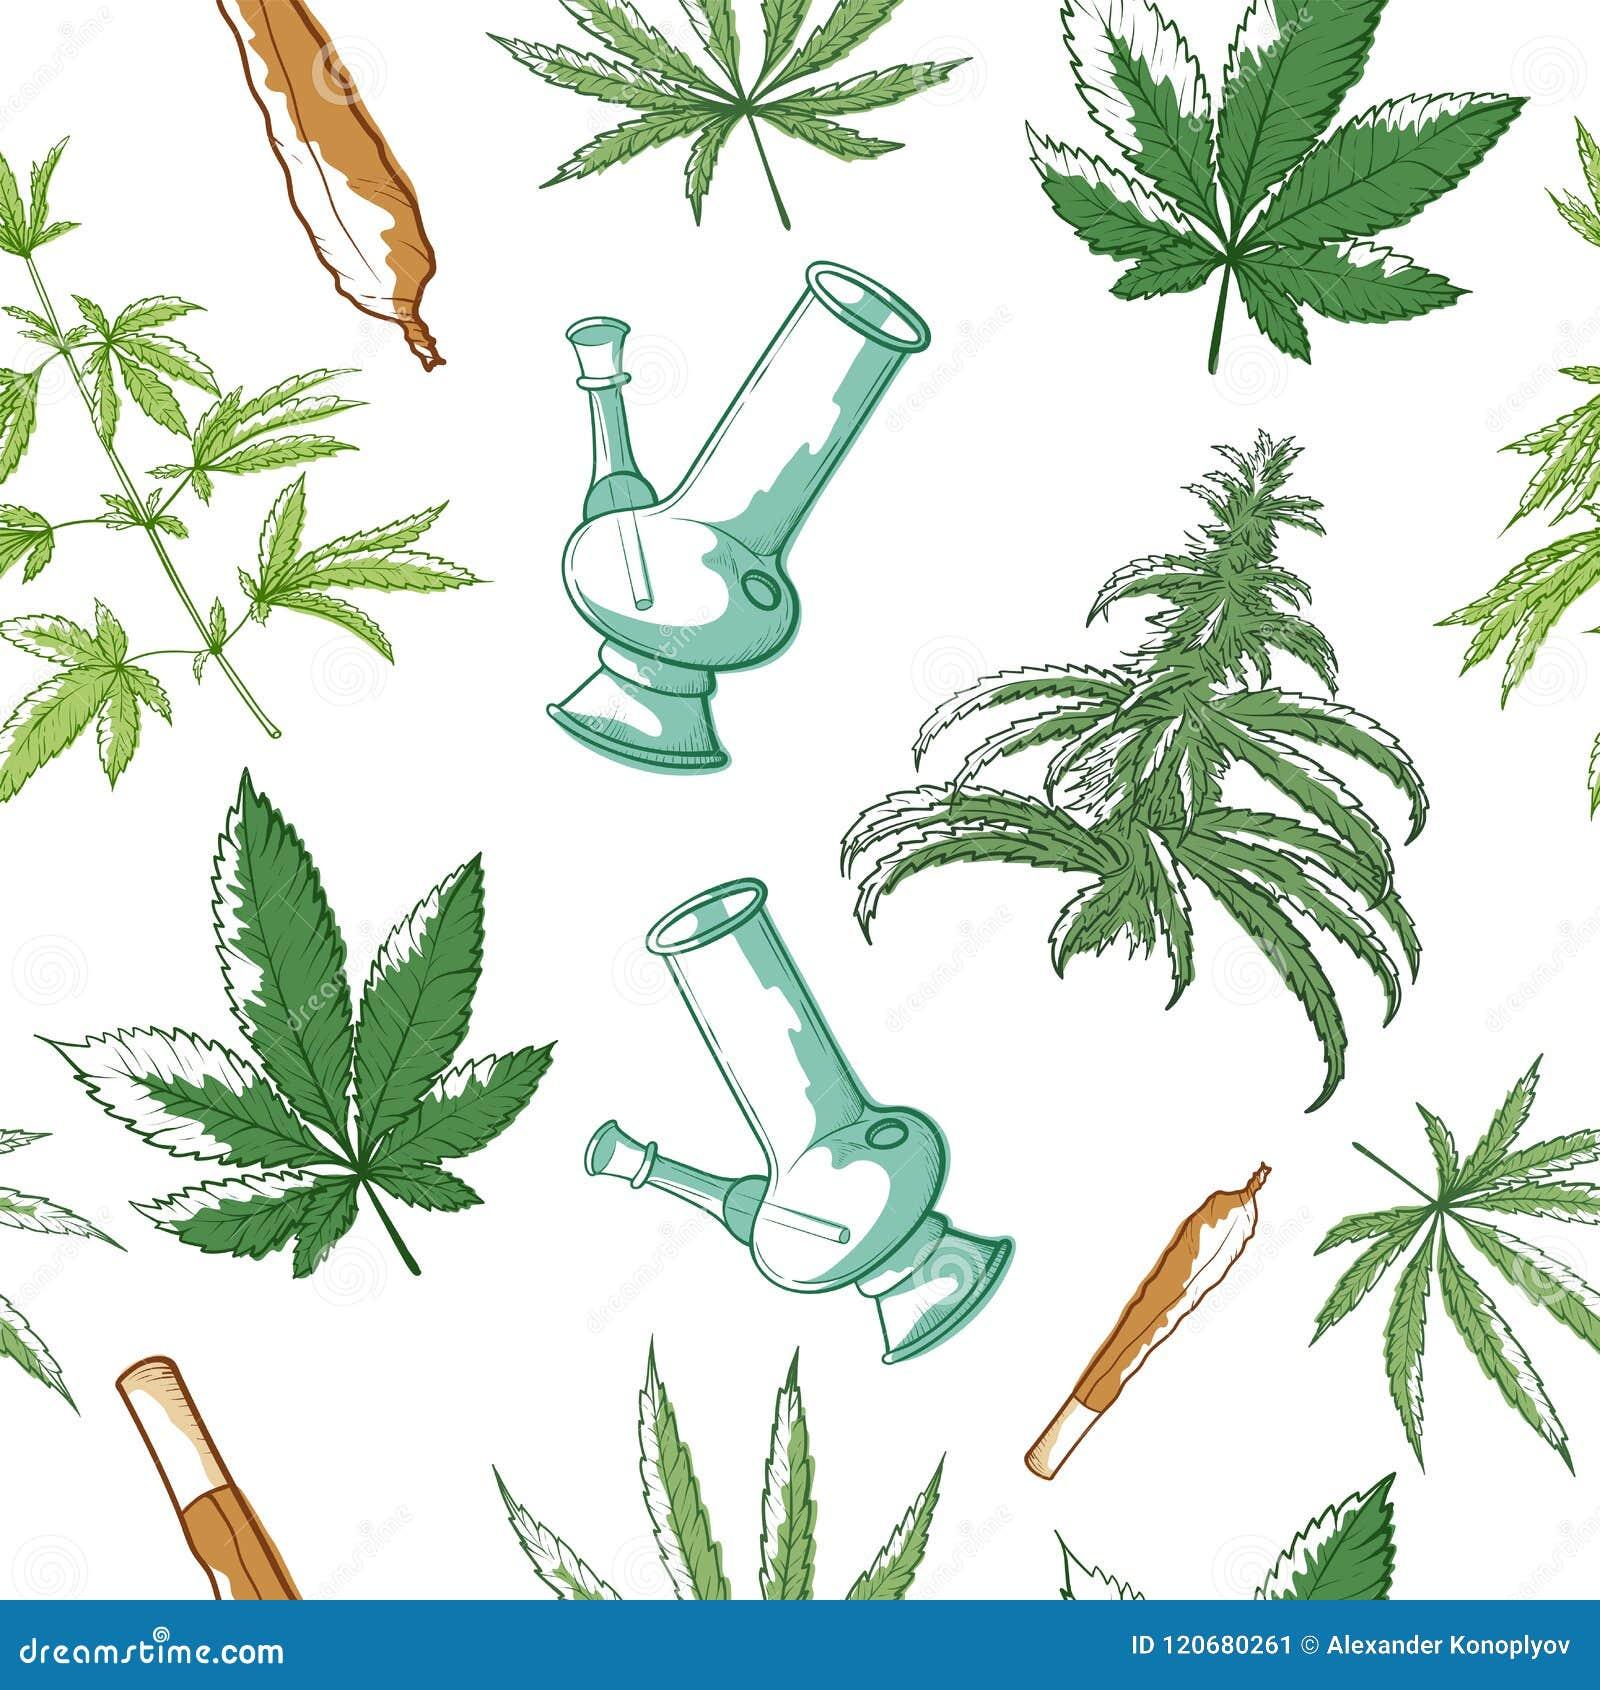 Марихуана картина медицинский сорт марихуаны